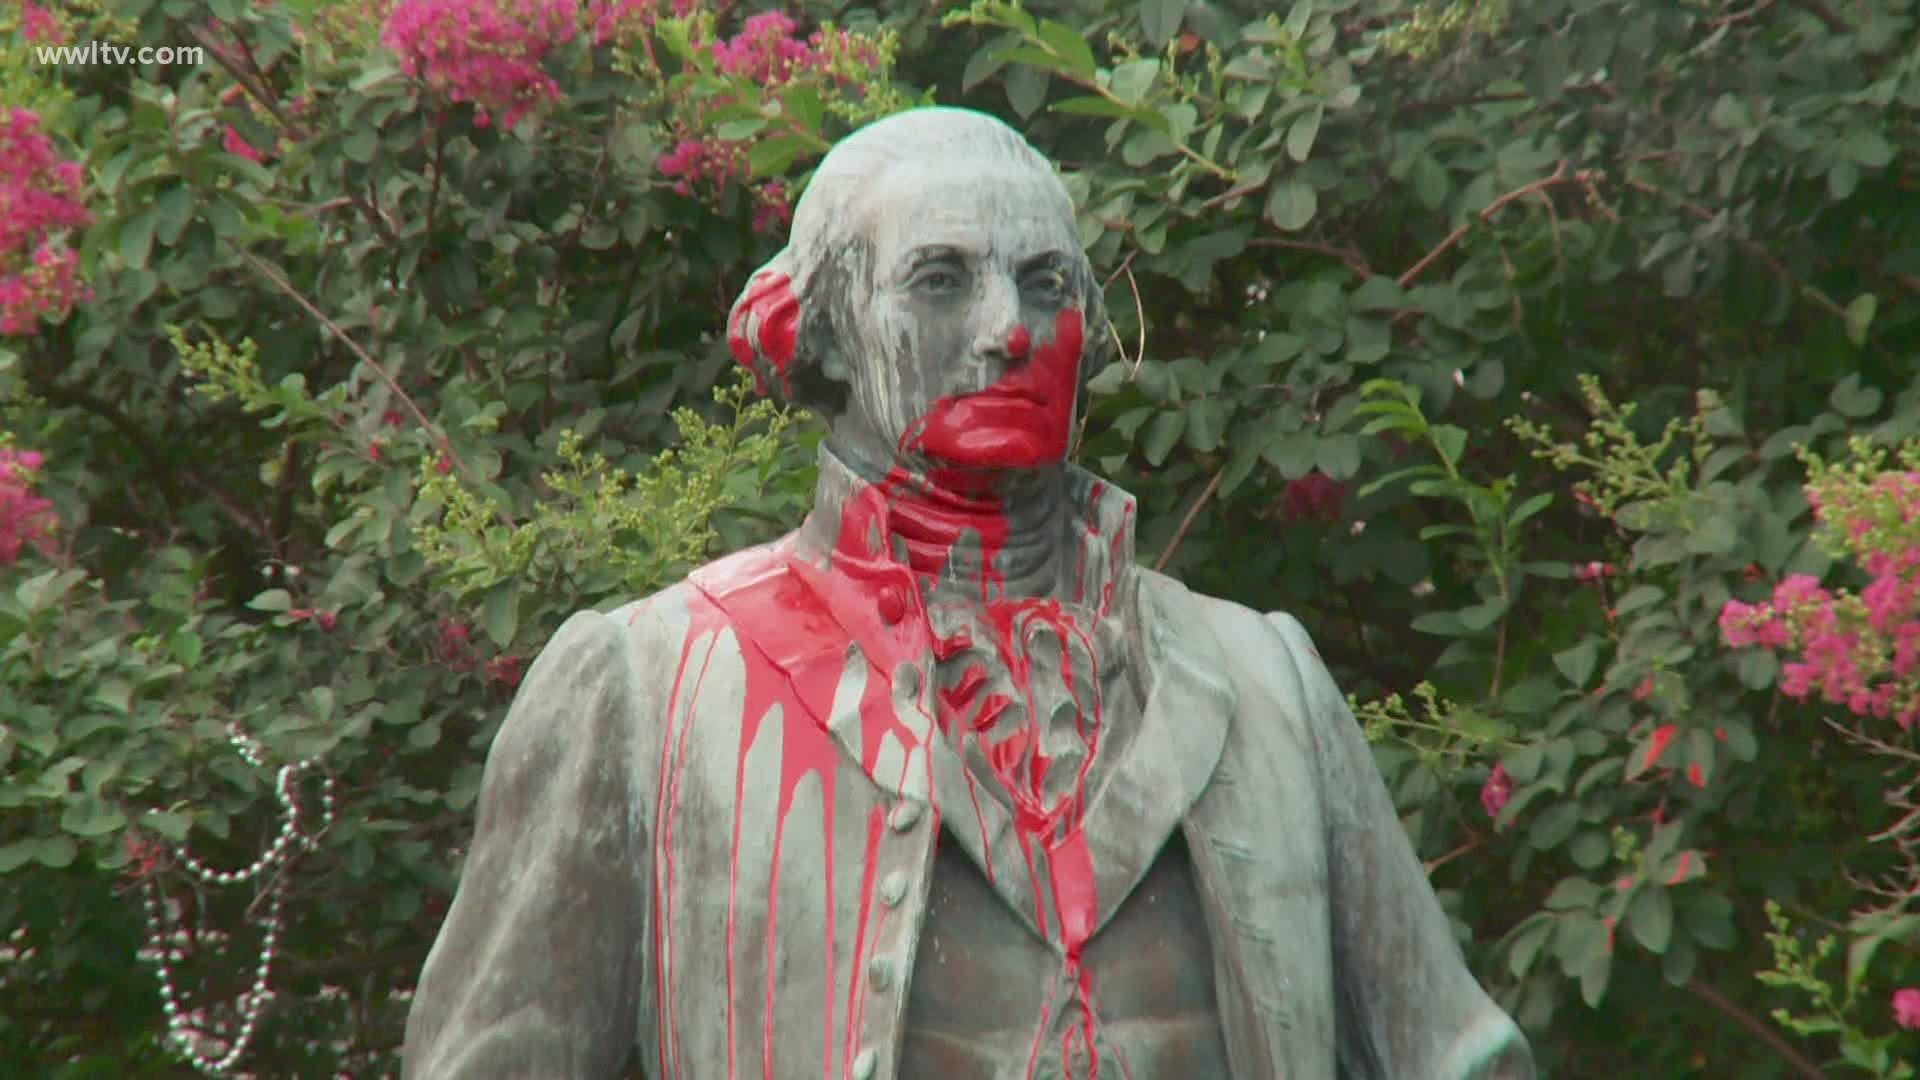 40 President Washington Statue defaced